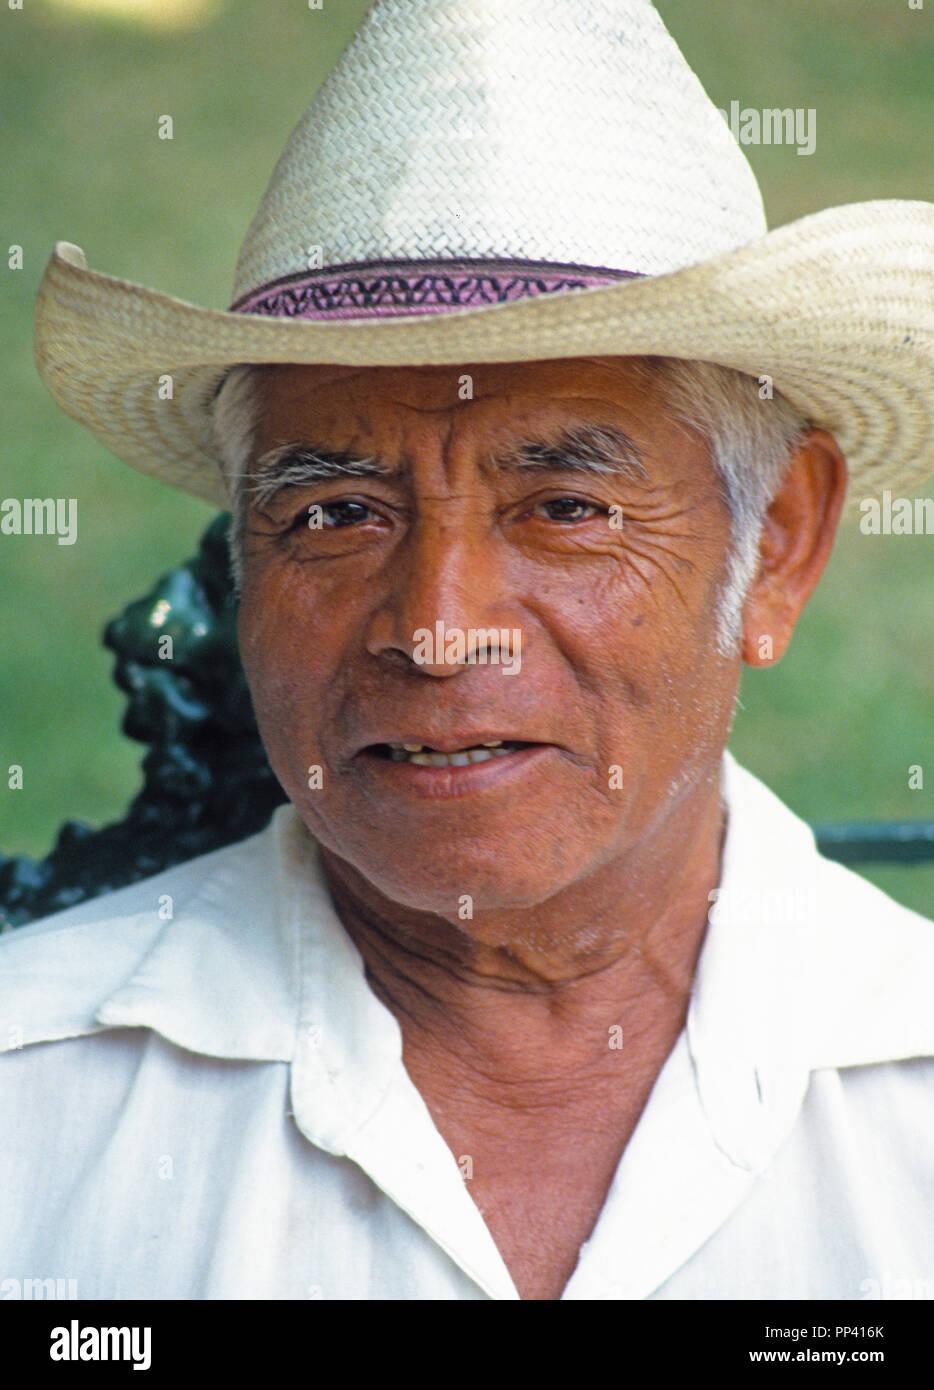 Portrait of elderly Mexican man in Zocalo of Oaxaca - Stock Image